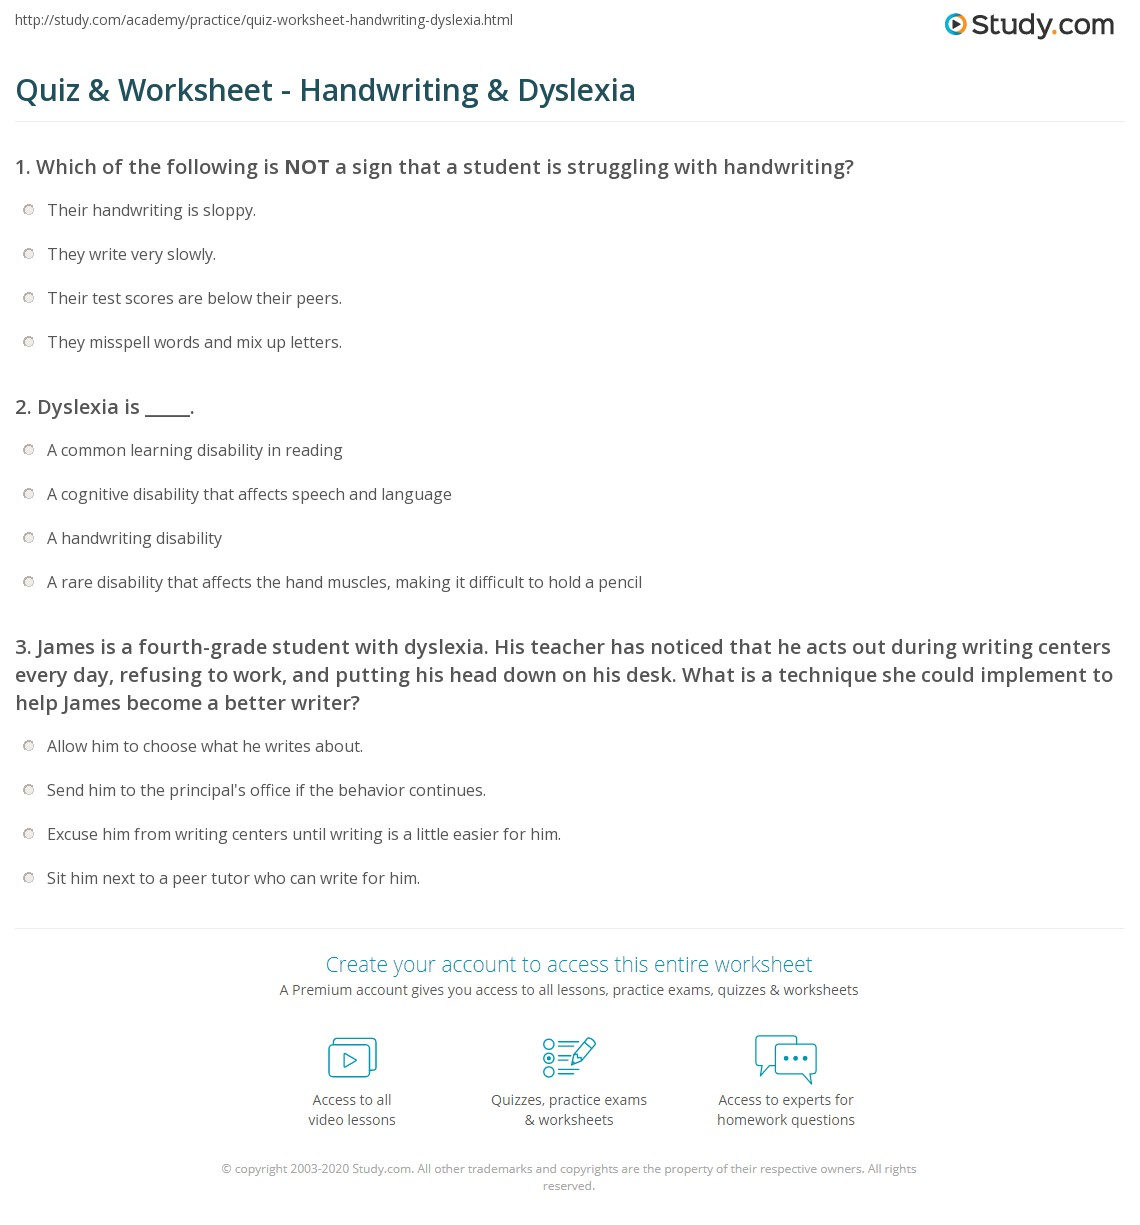 quiz worksheet handwriting dyslexia. Black Bedroom Furniture Sets. Home Design Ideas